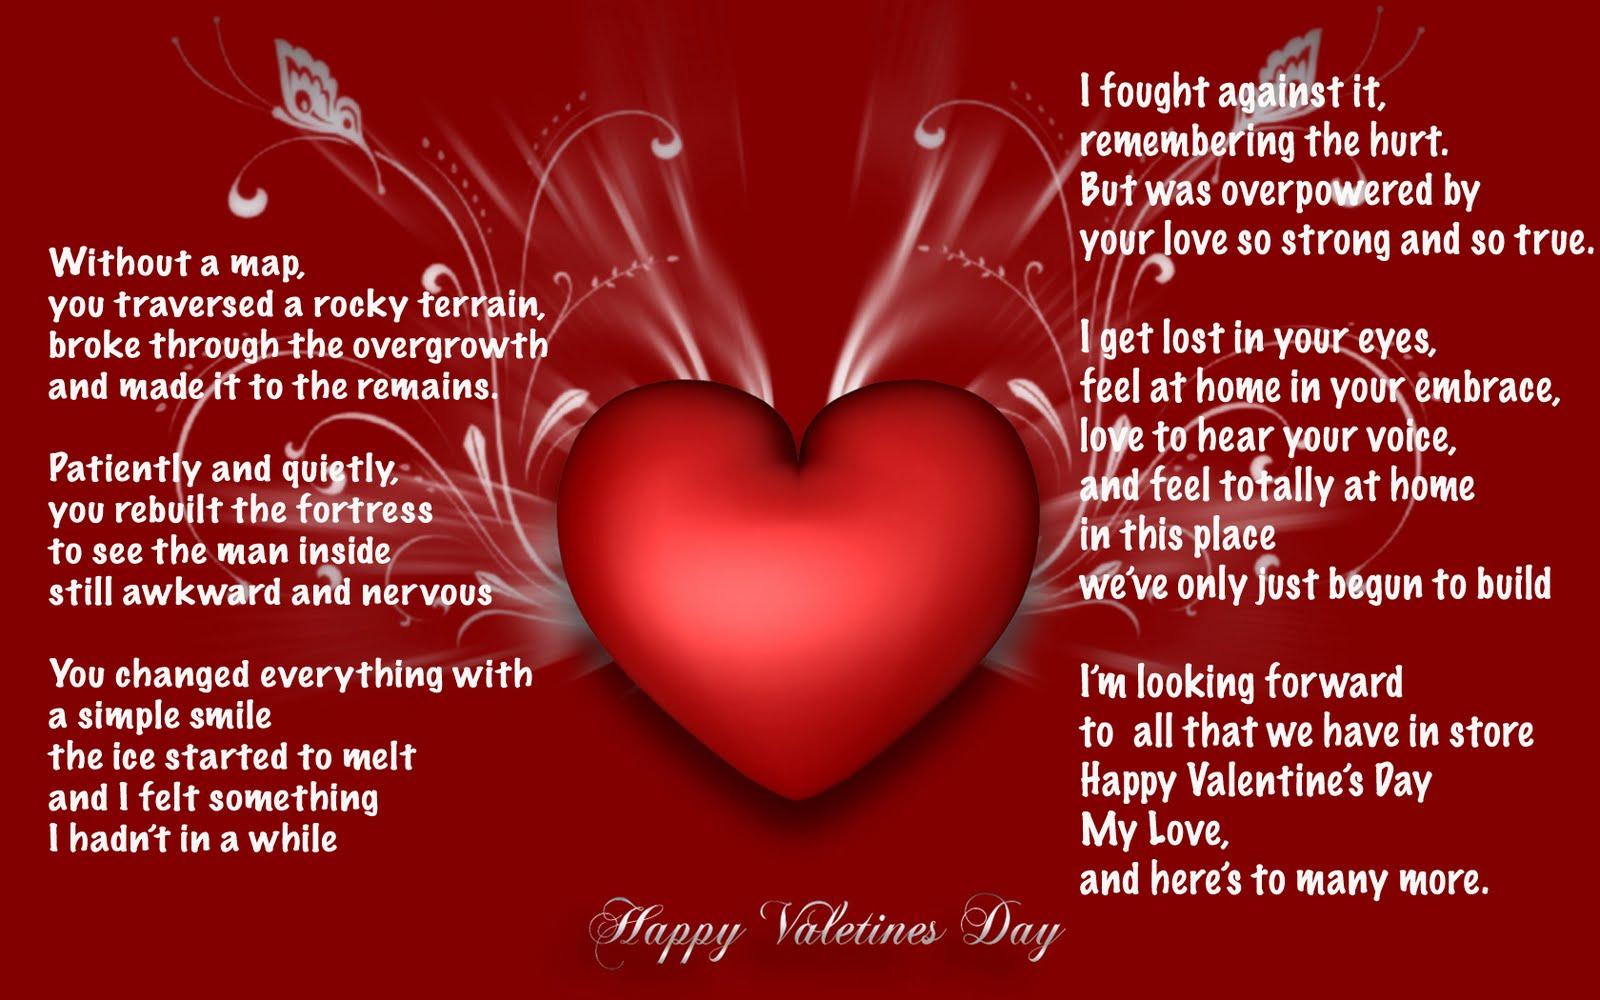 Best Valentine: February 2014